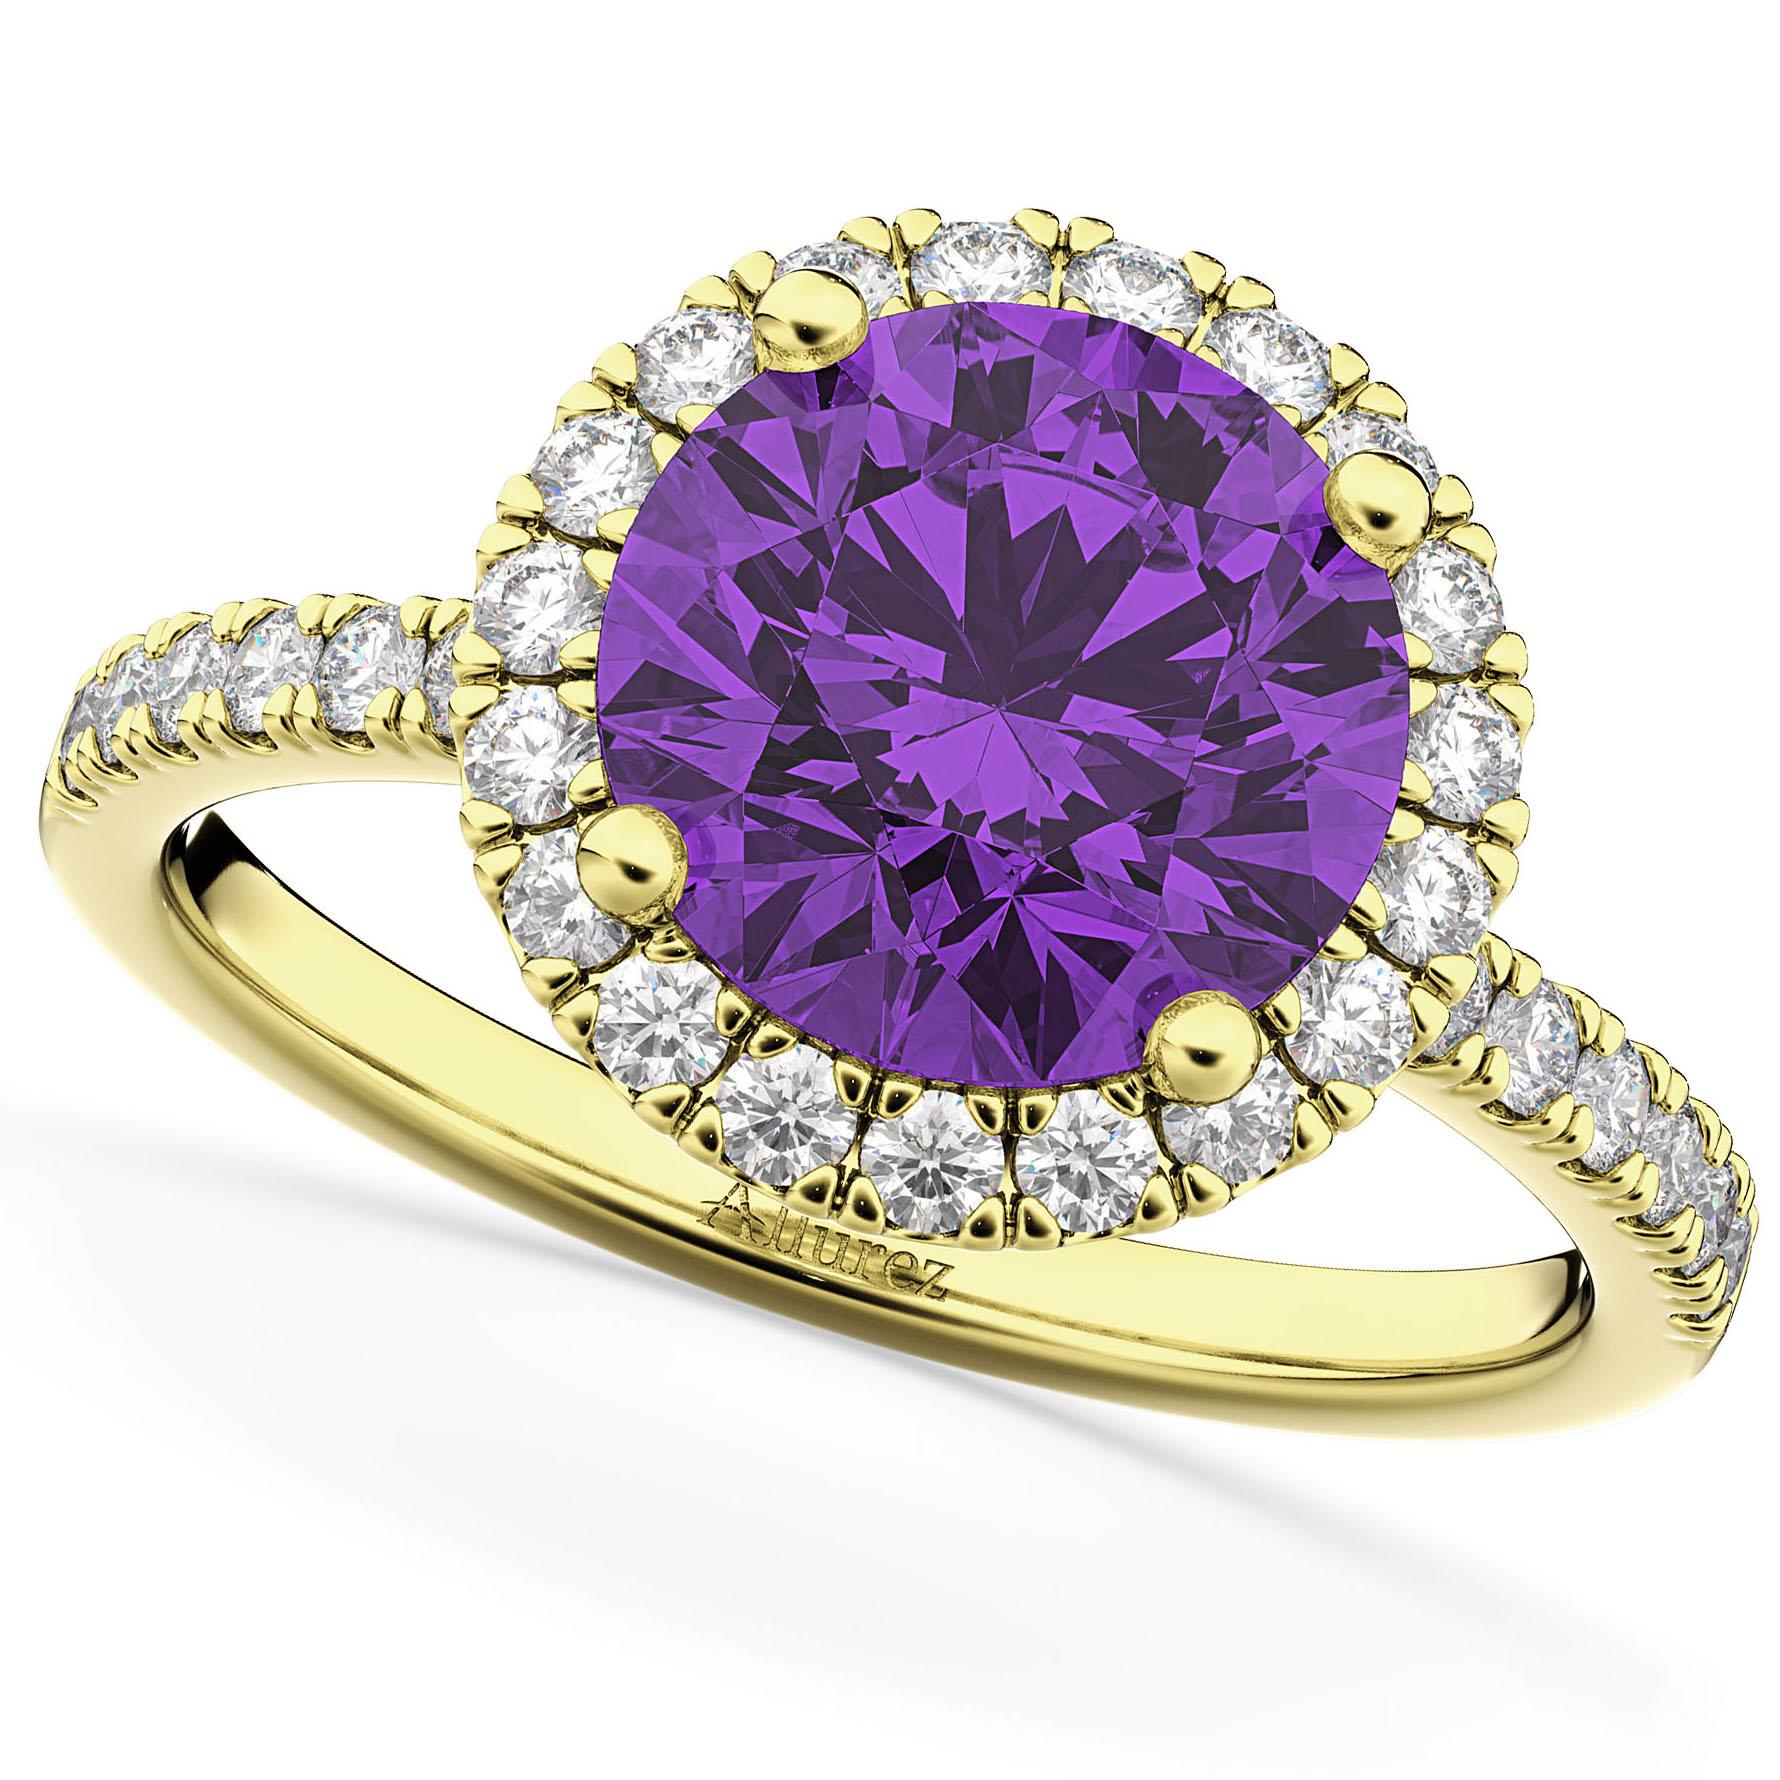 Halo Amethyst & Diamond Engagement Ring 18K Yellow Gold 2.30ct